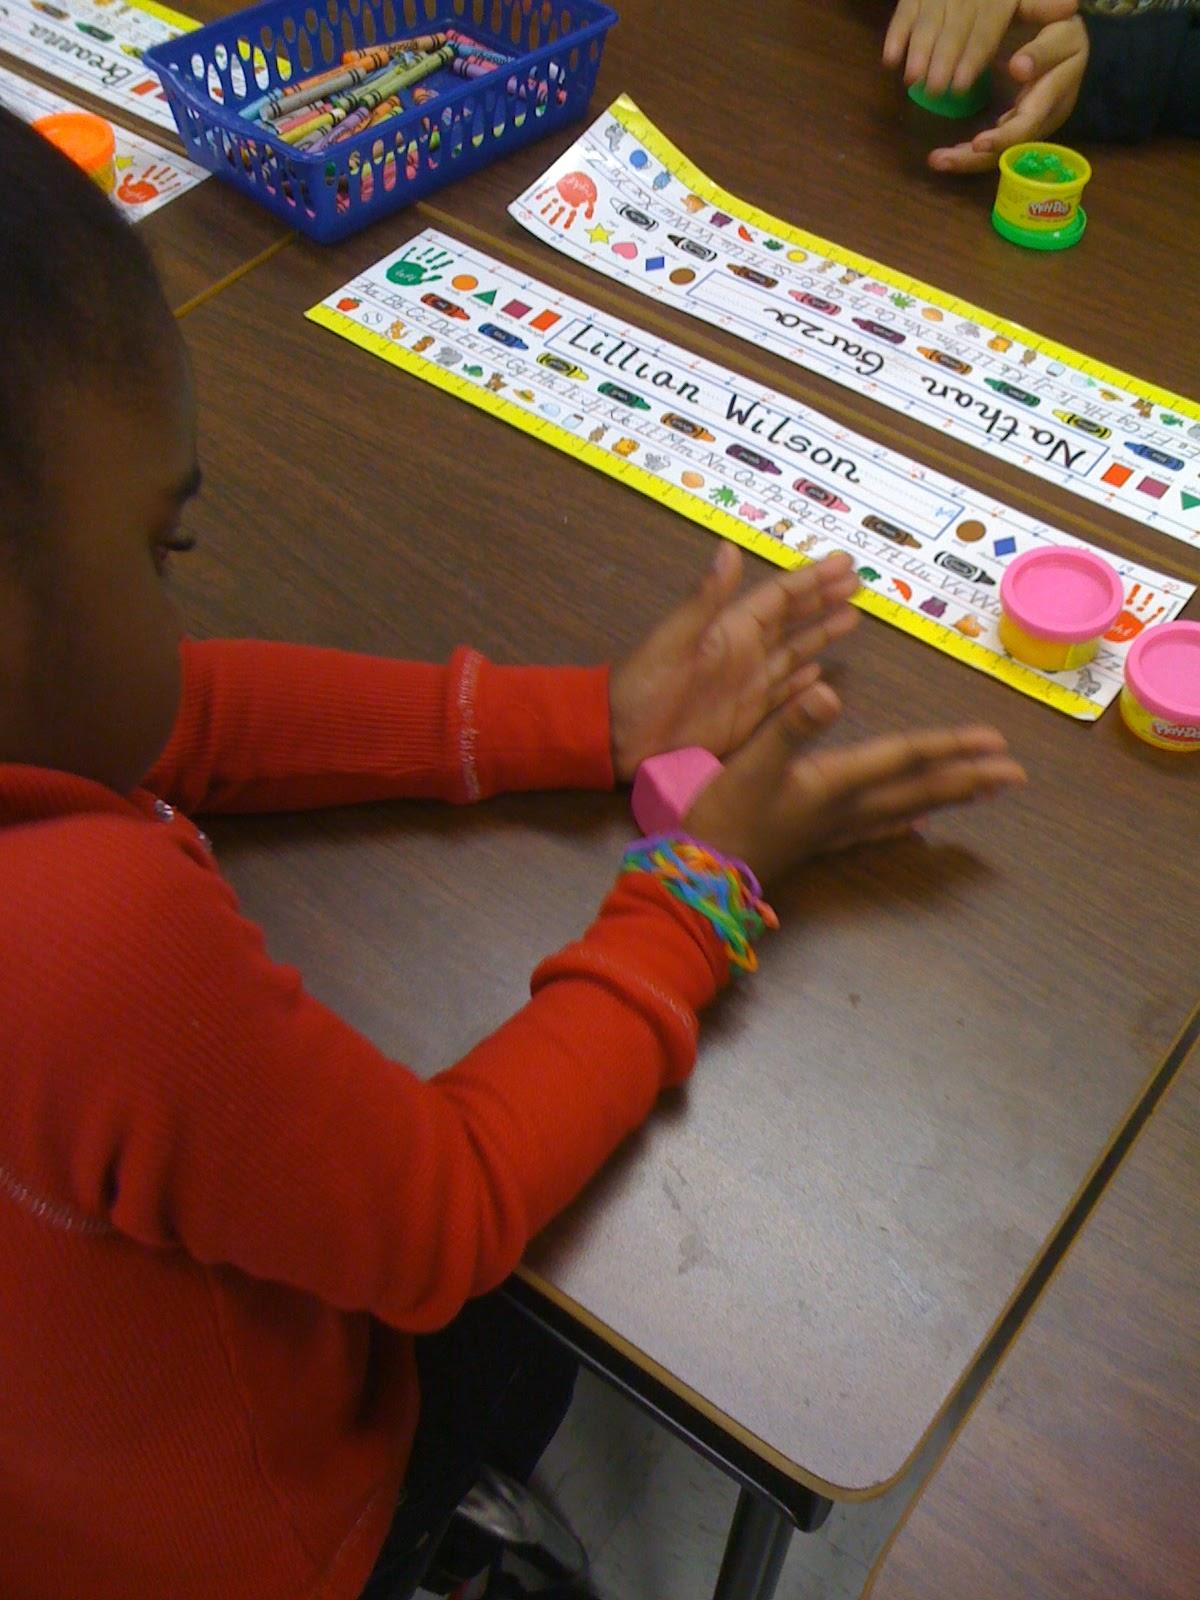 Bishop S Blackboard An Elementary Education Blog 3d Shapes